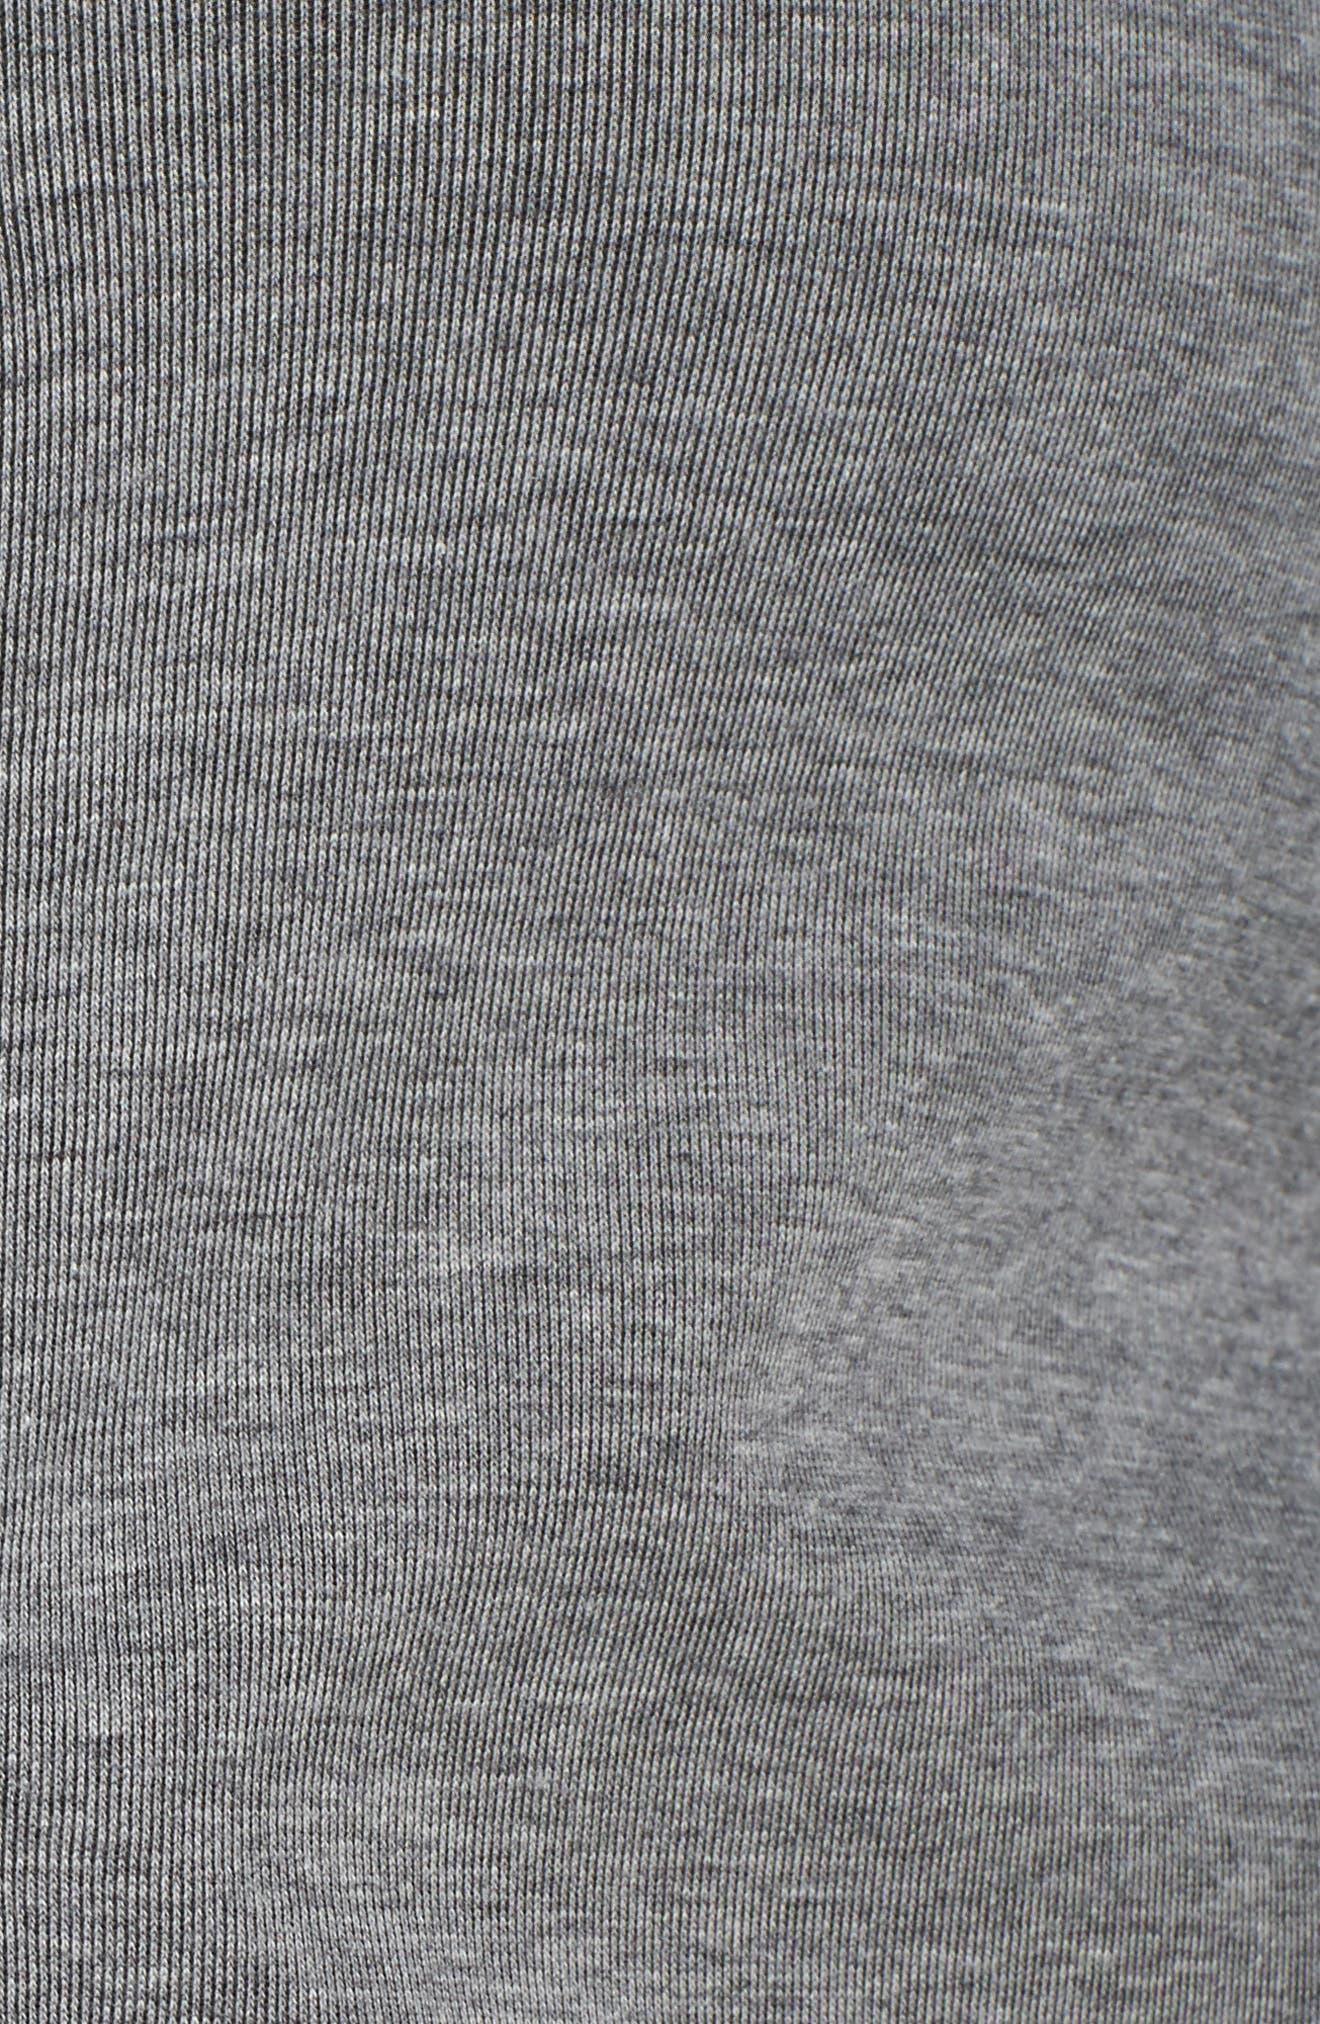 Tech Fleece Hoodie,                             Alternate thumbnail 6, color,                             Carbon Heather/ Heather/ Black